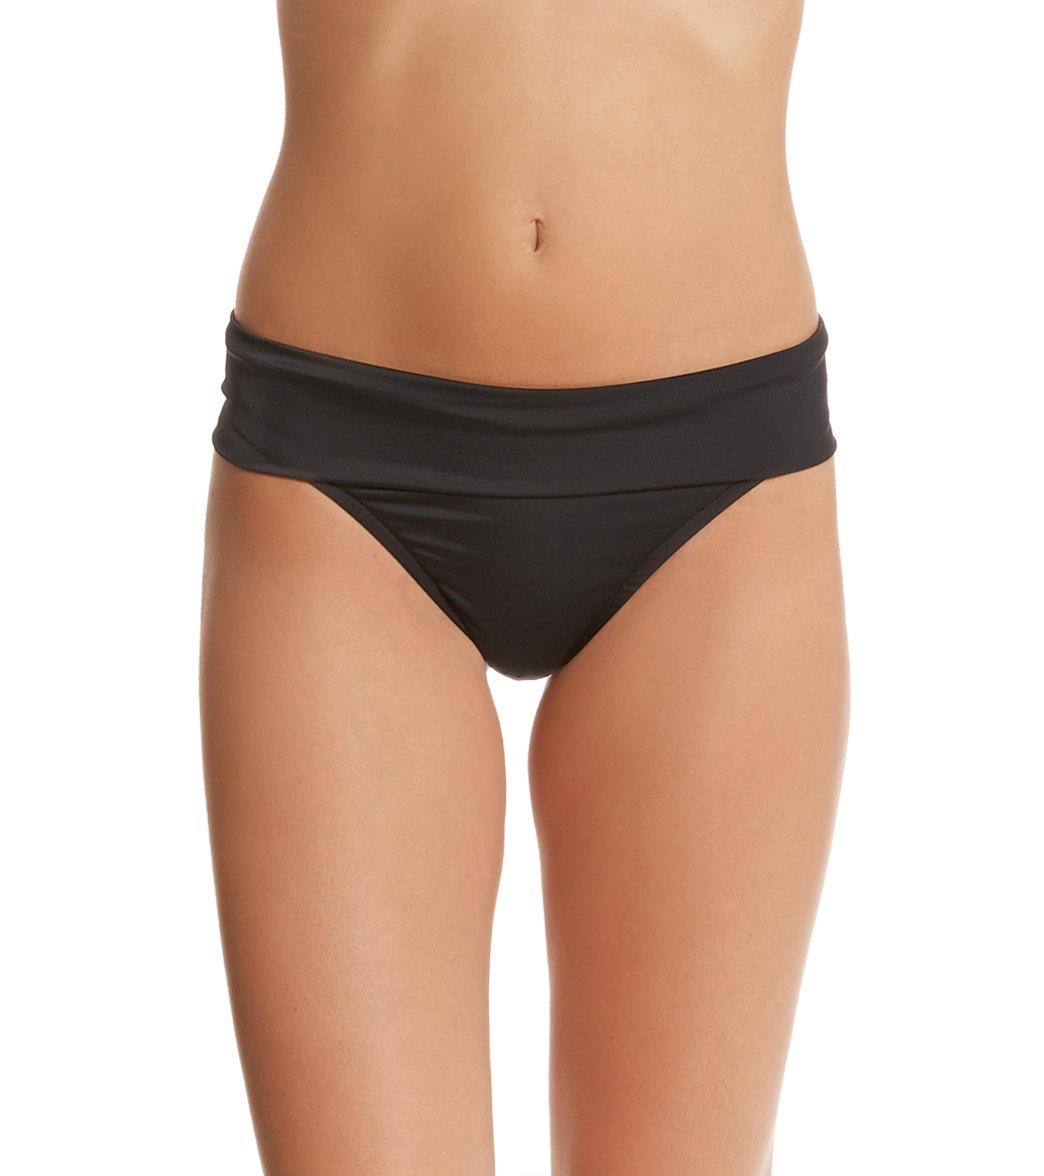 03f5eb36530 ... UJENA Sexy Banded Thong Bikini Bottom. MODEL MEASUREMENTS